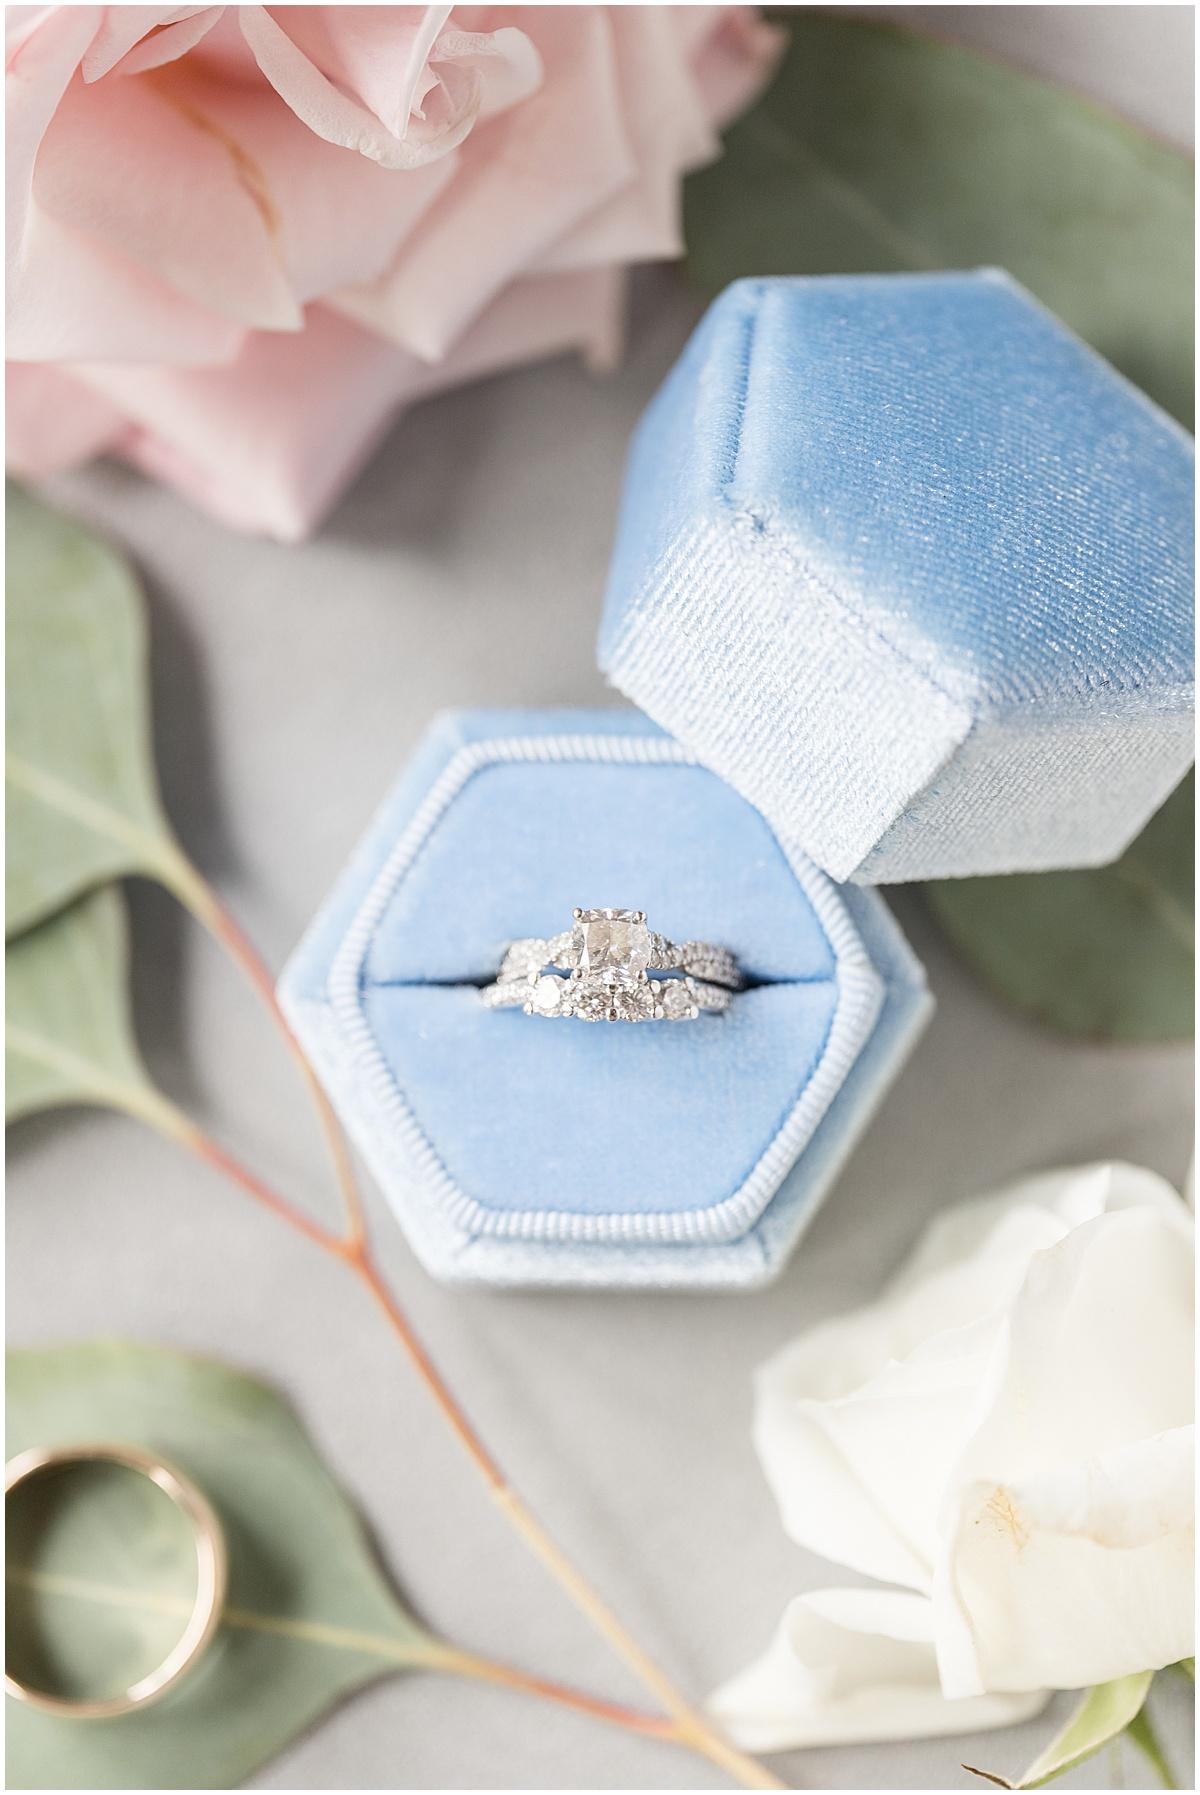 Bridal details from Lizton Lodge Wedding in Lizton, Indiana